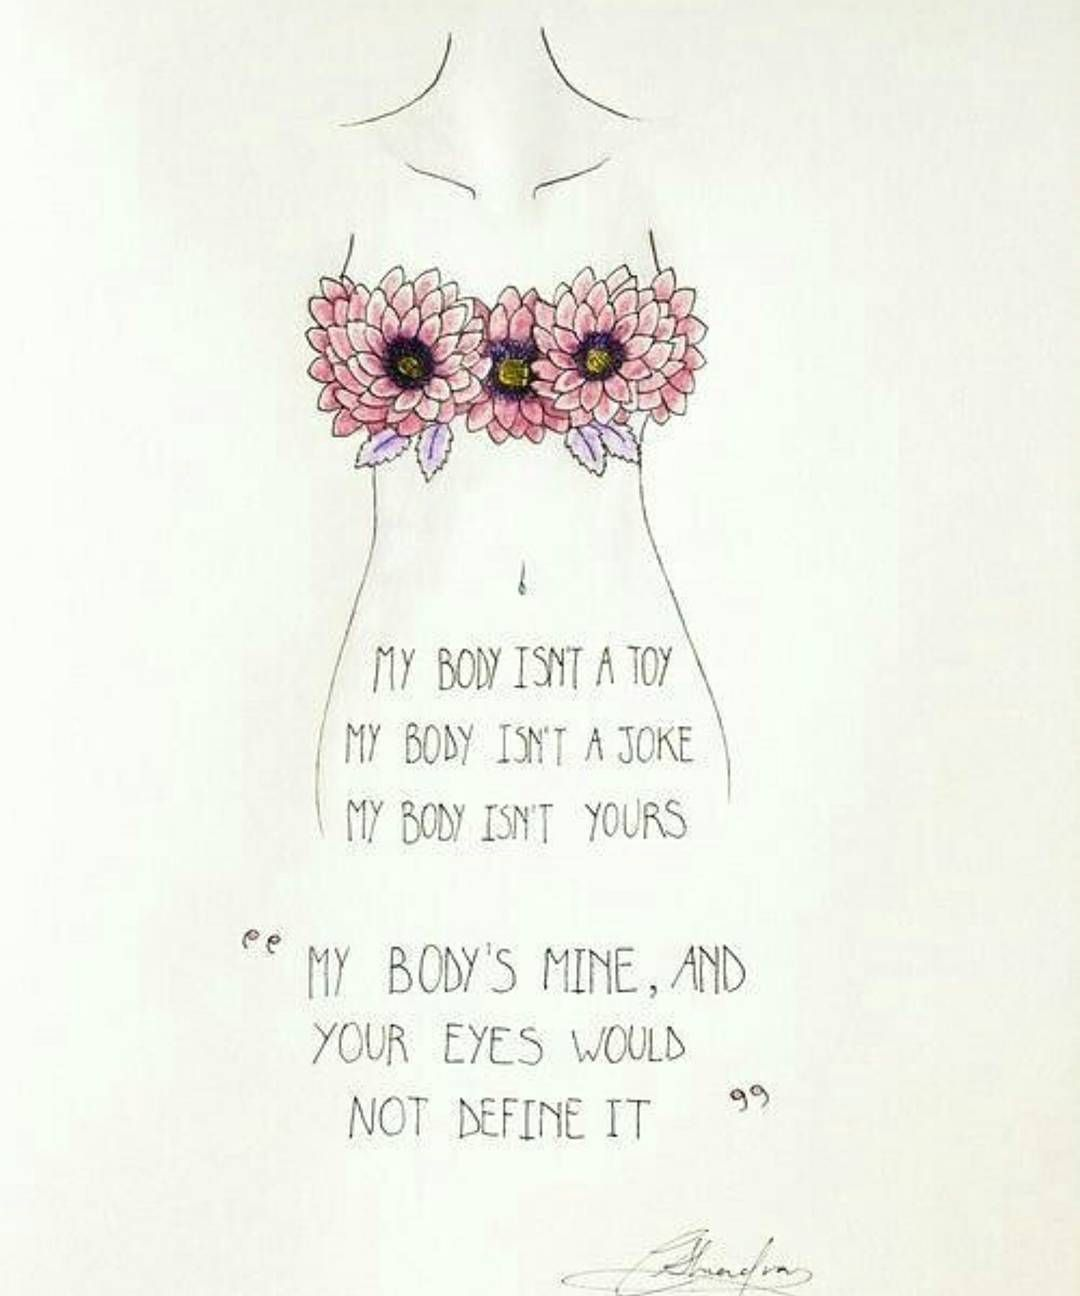 Pin By Punksexual On F E M I N I S M Pinterest Feminism